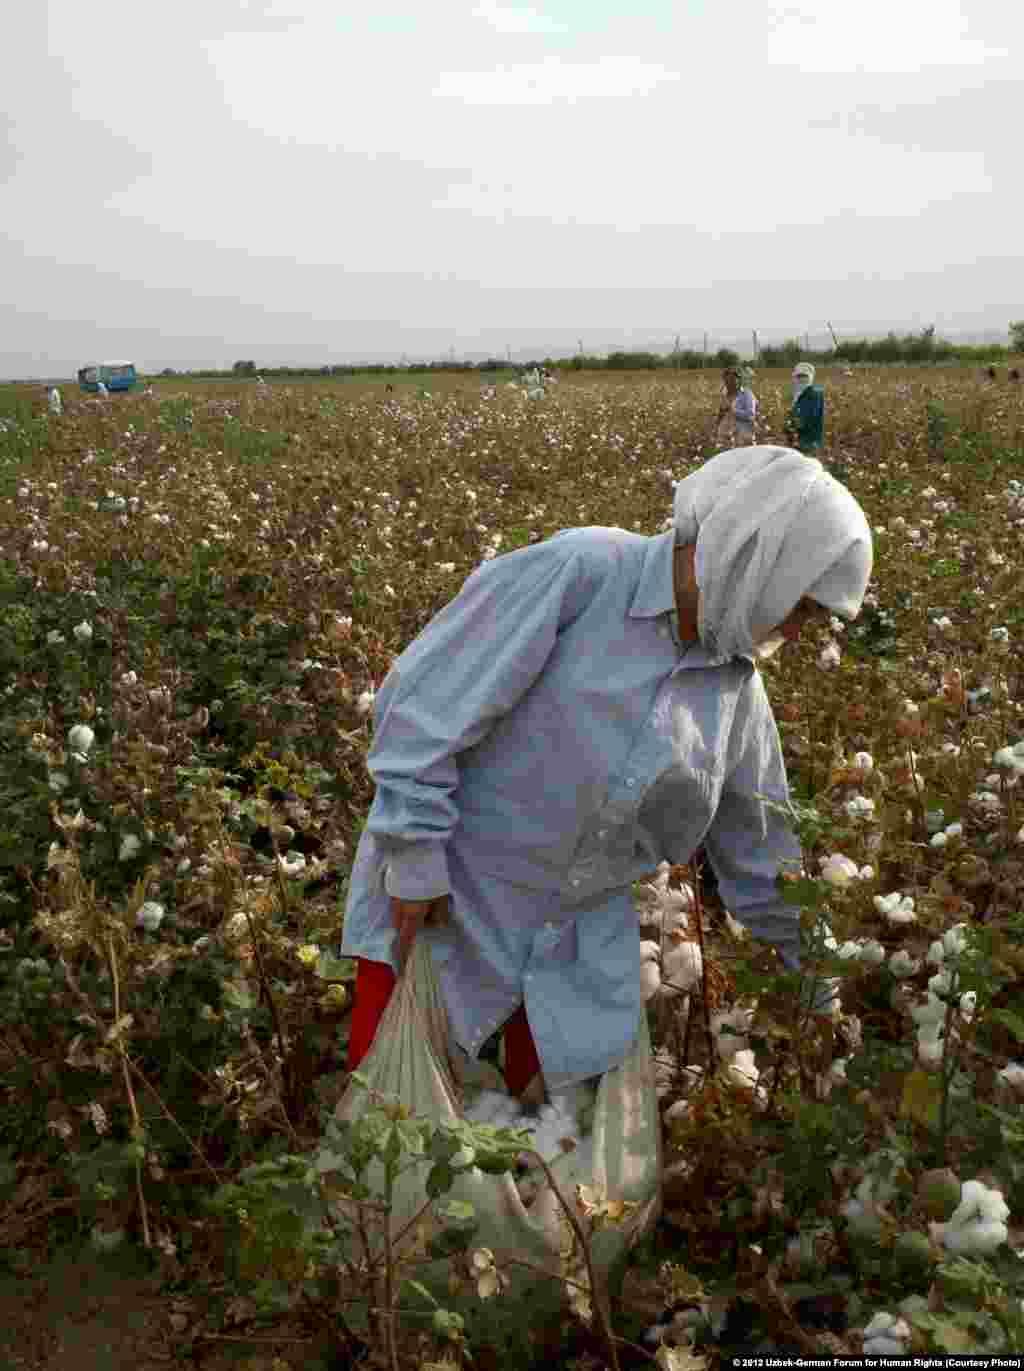 A woman who identified herself as a teacher picks cotton in Jizzakh Province on September 25, 2012.